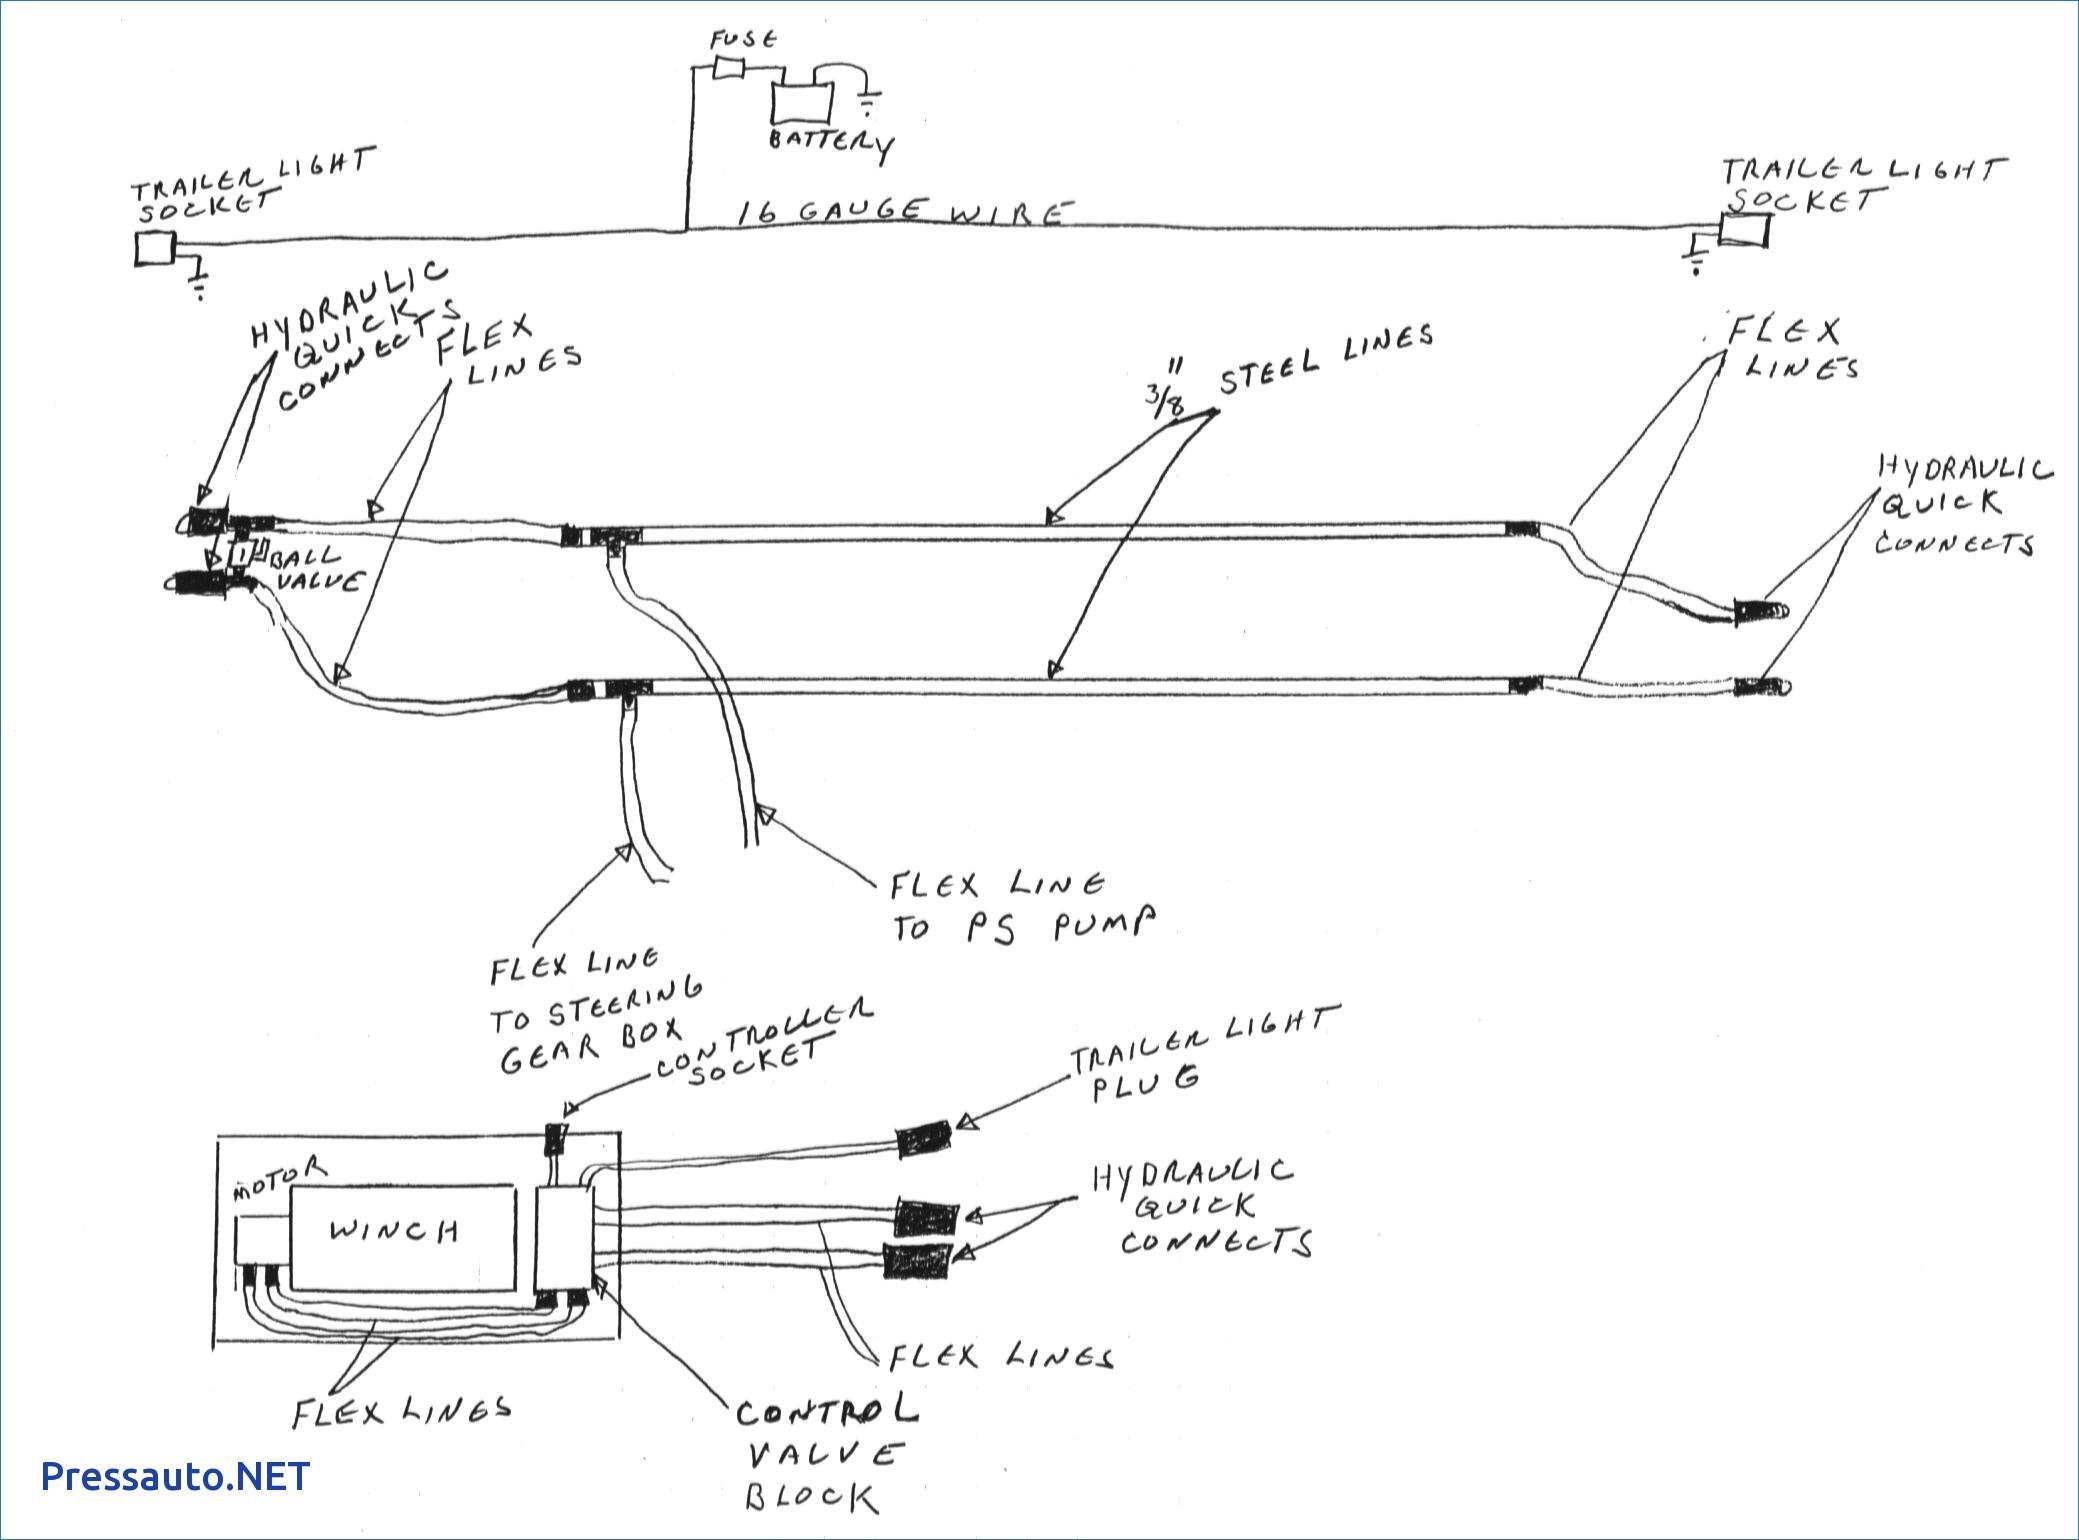 Winch wiring diagram lovely ch ion winch wiring diagram wiring 12v electric winch solenoid schematic 12v winch